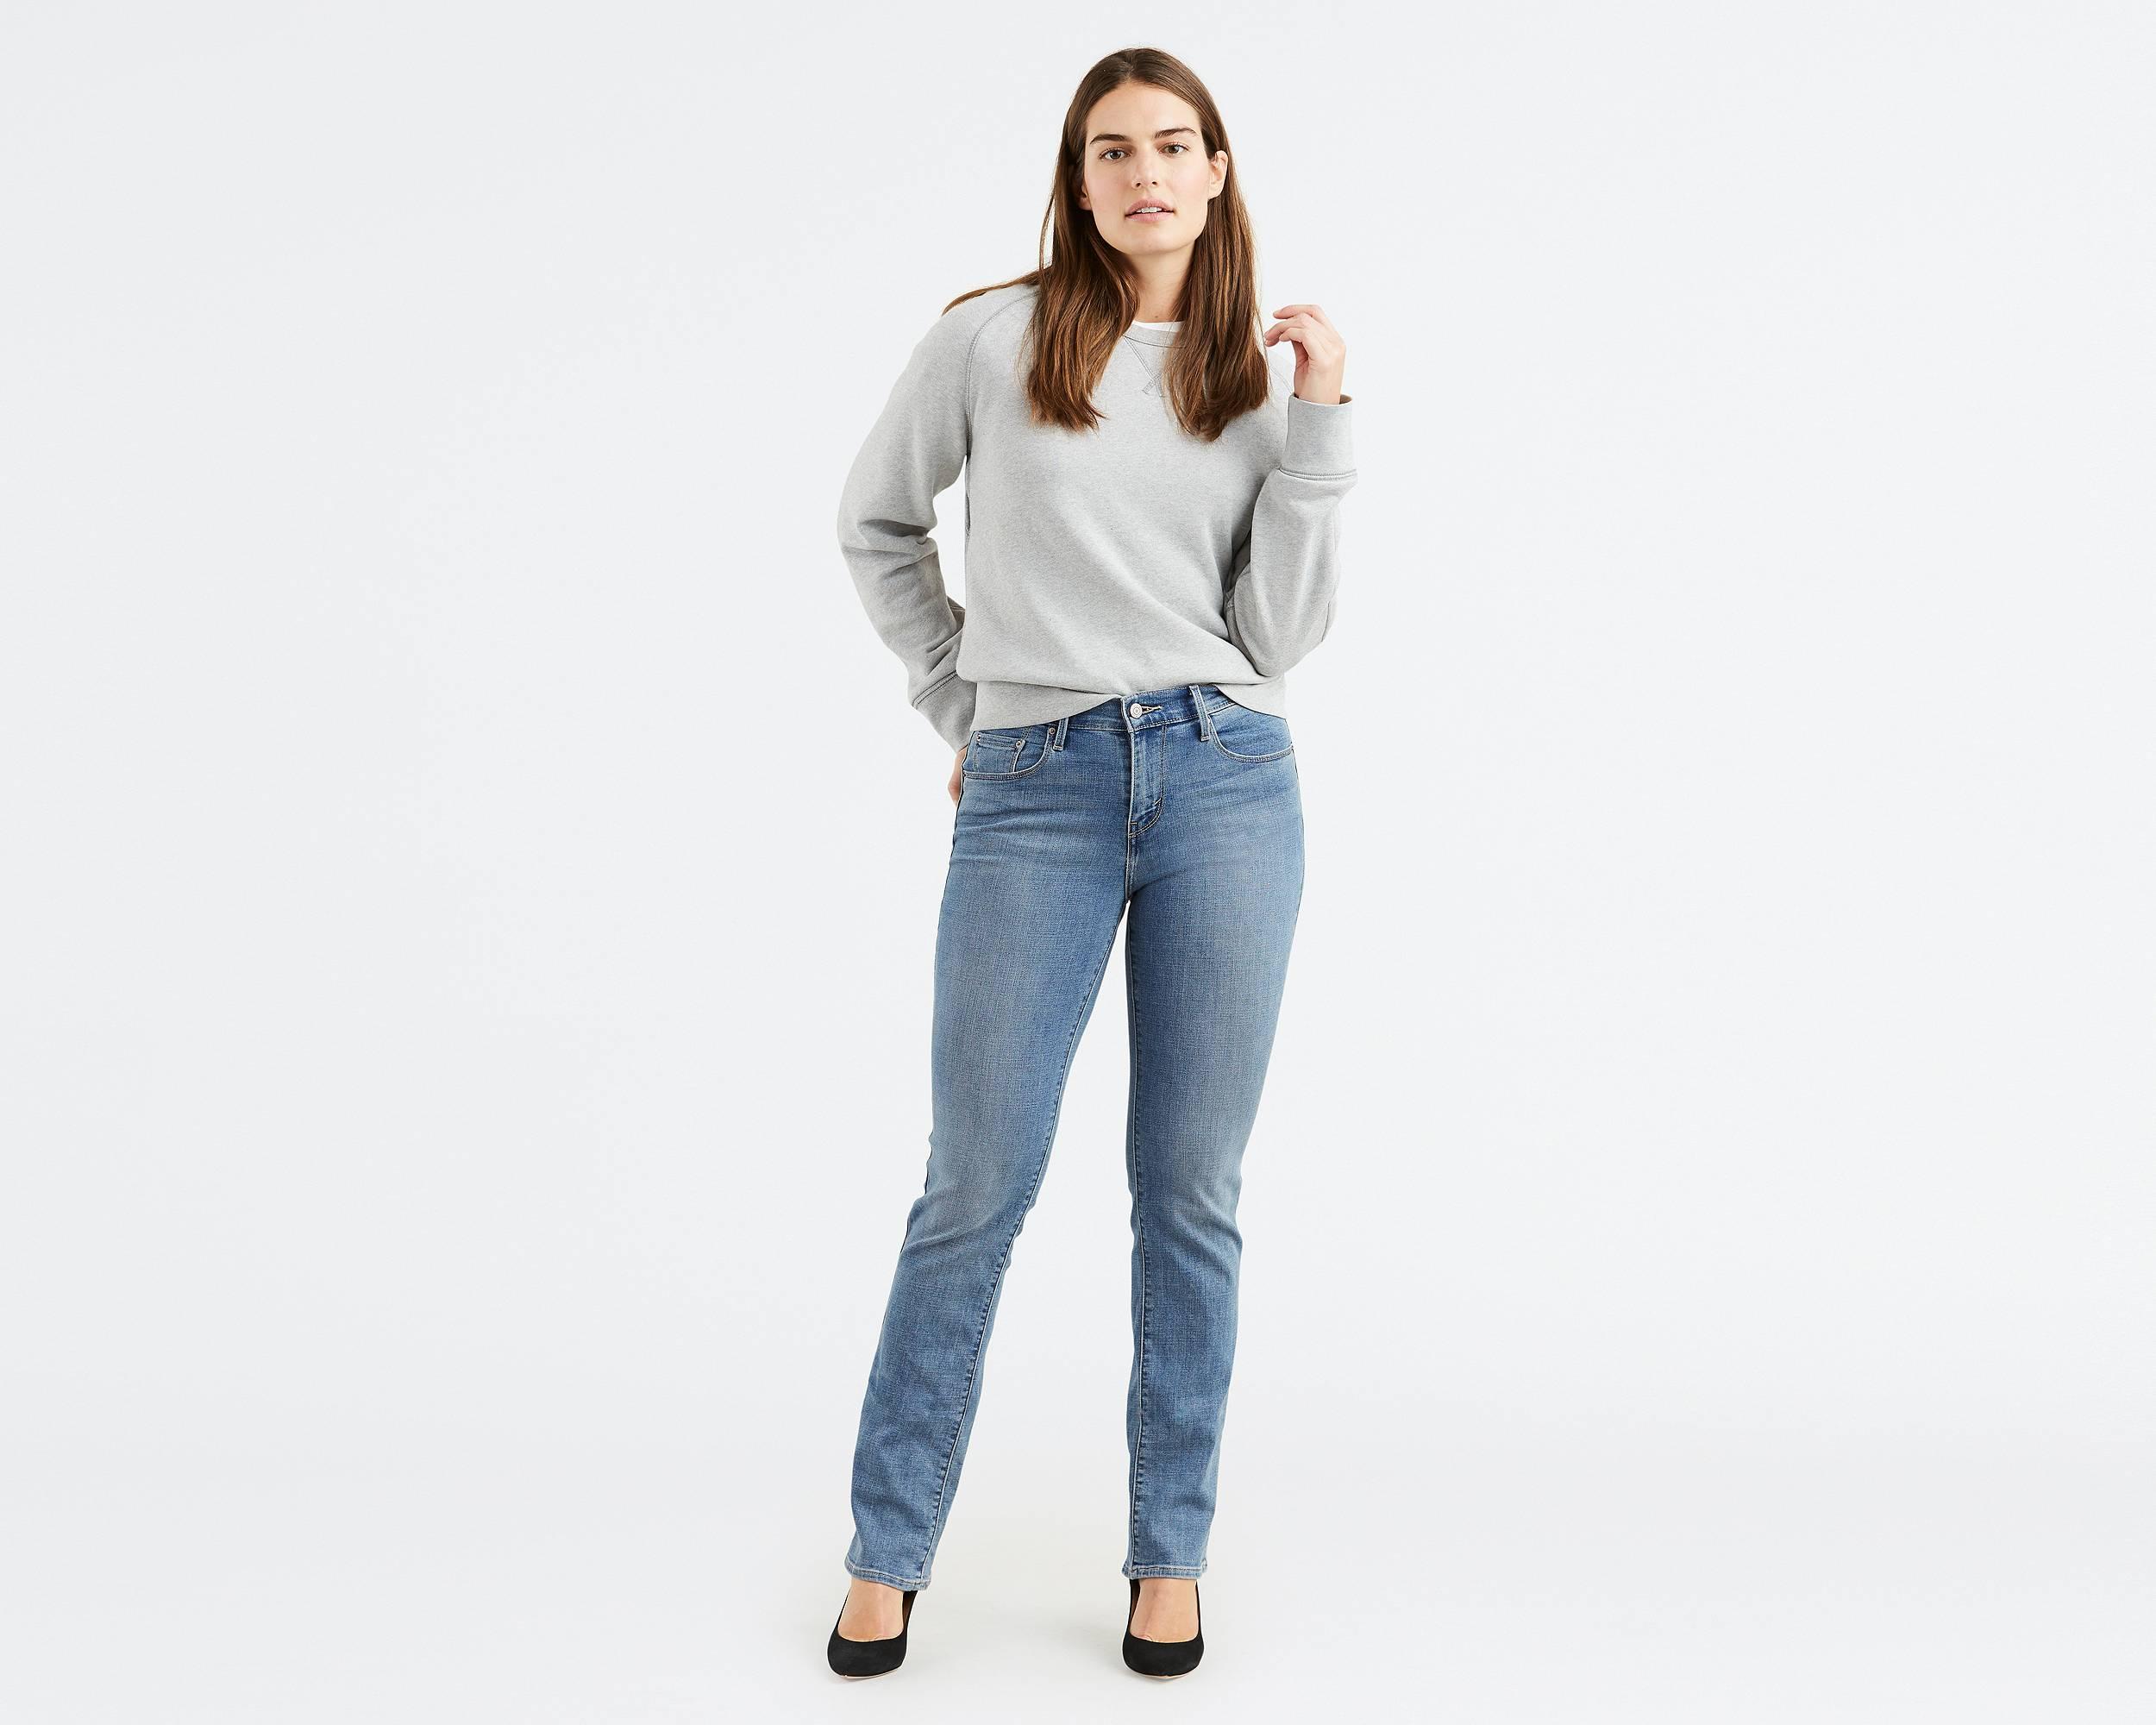 505™ Straight Leg Jeans | Ambiance |Levi's® United States (US)